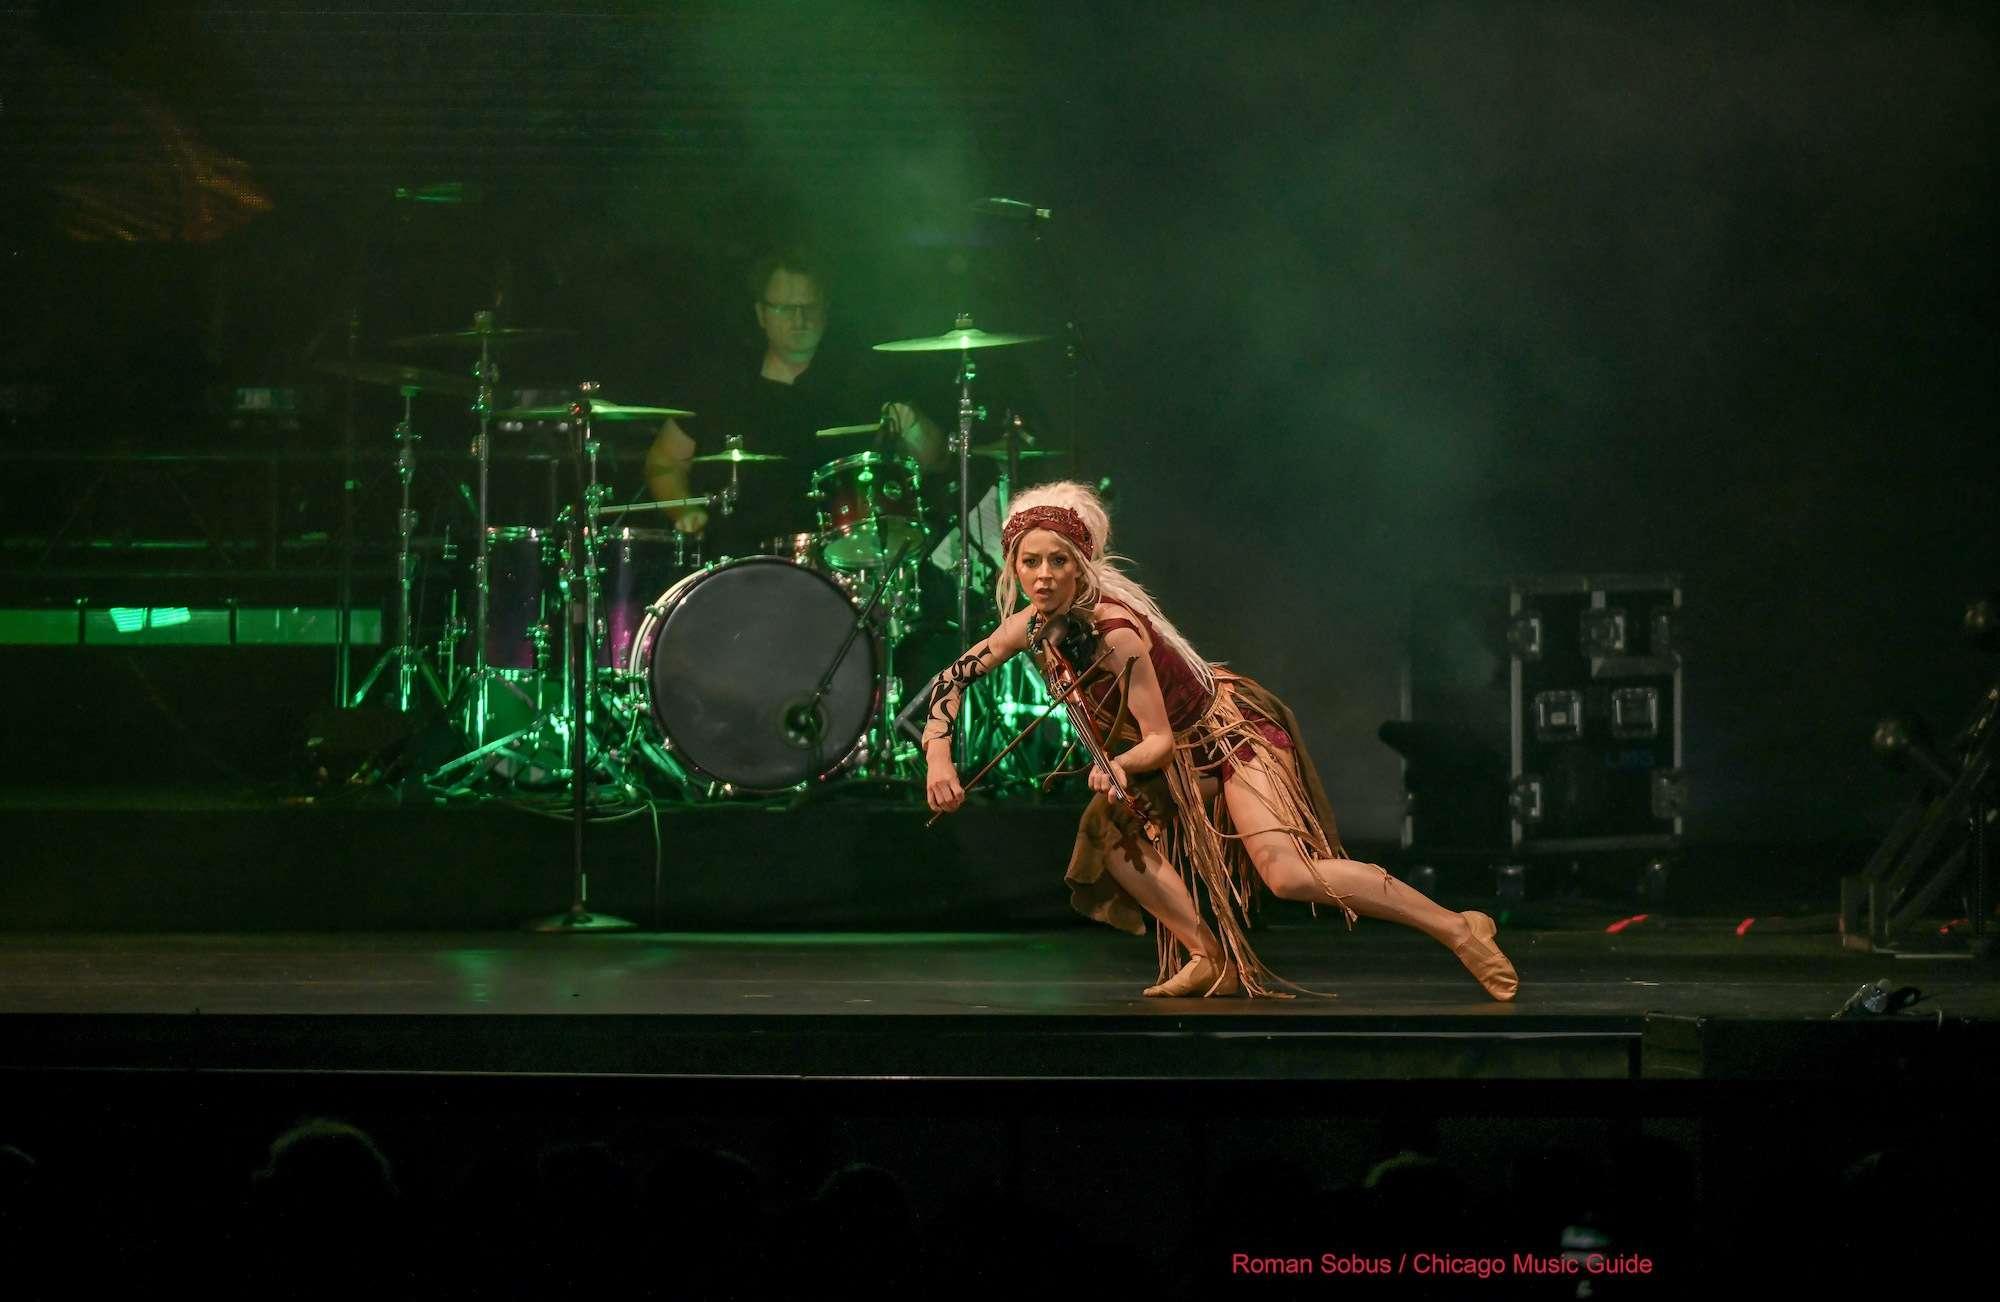 Lindsey Stirling - Huntington Bank Pavilion - Chicago, IL - 08/20/2021 - Photo © 2021 by: Roman Sobus